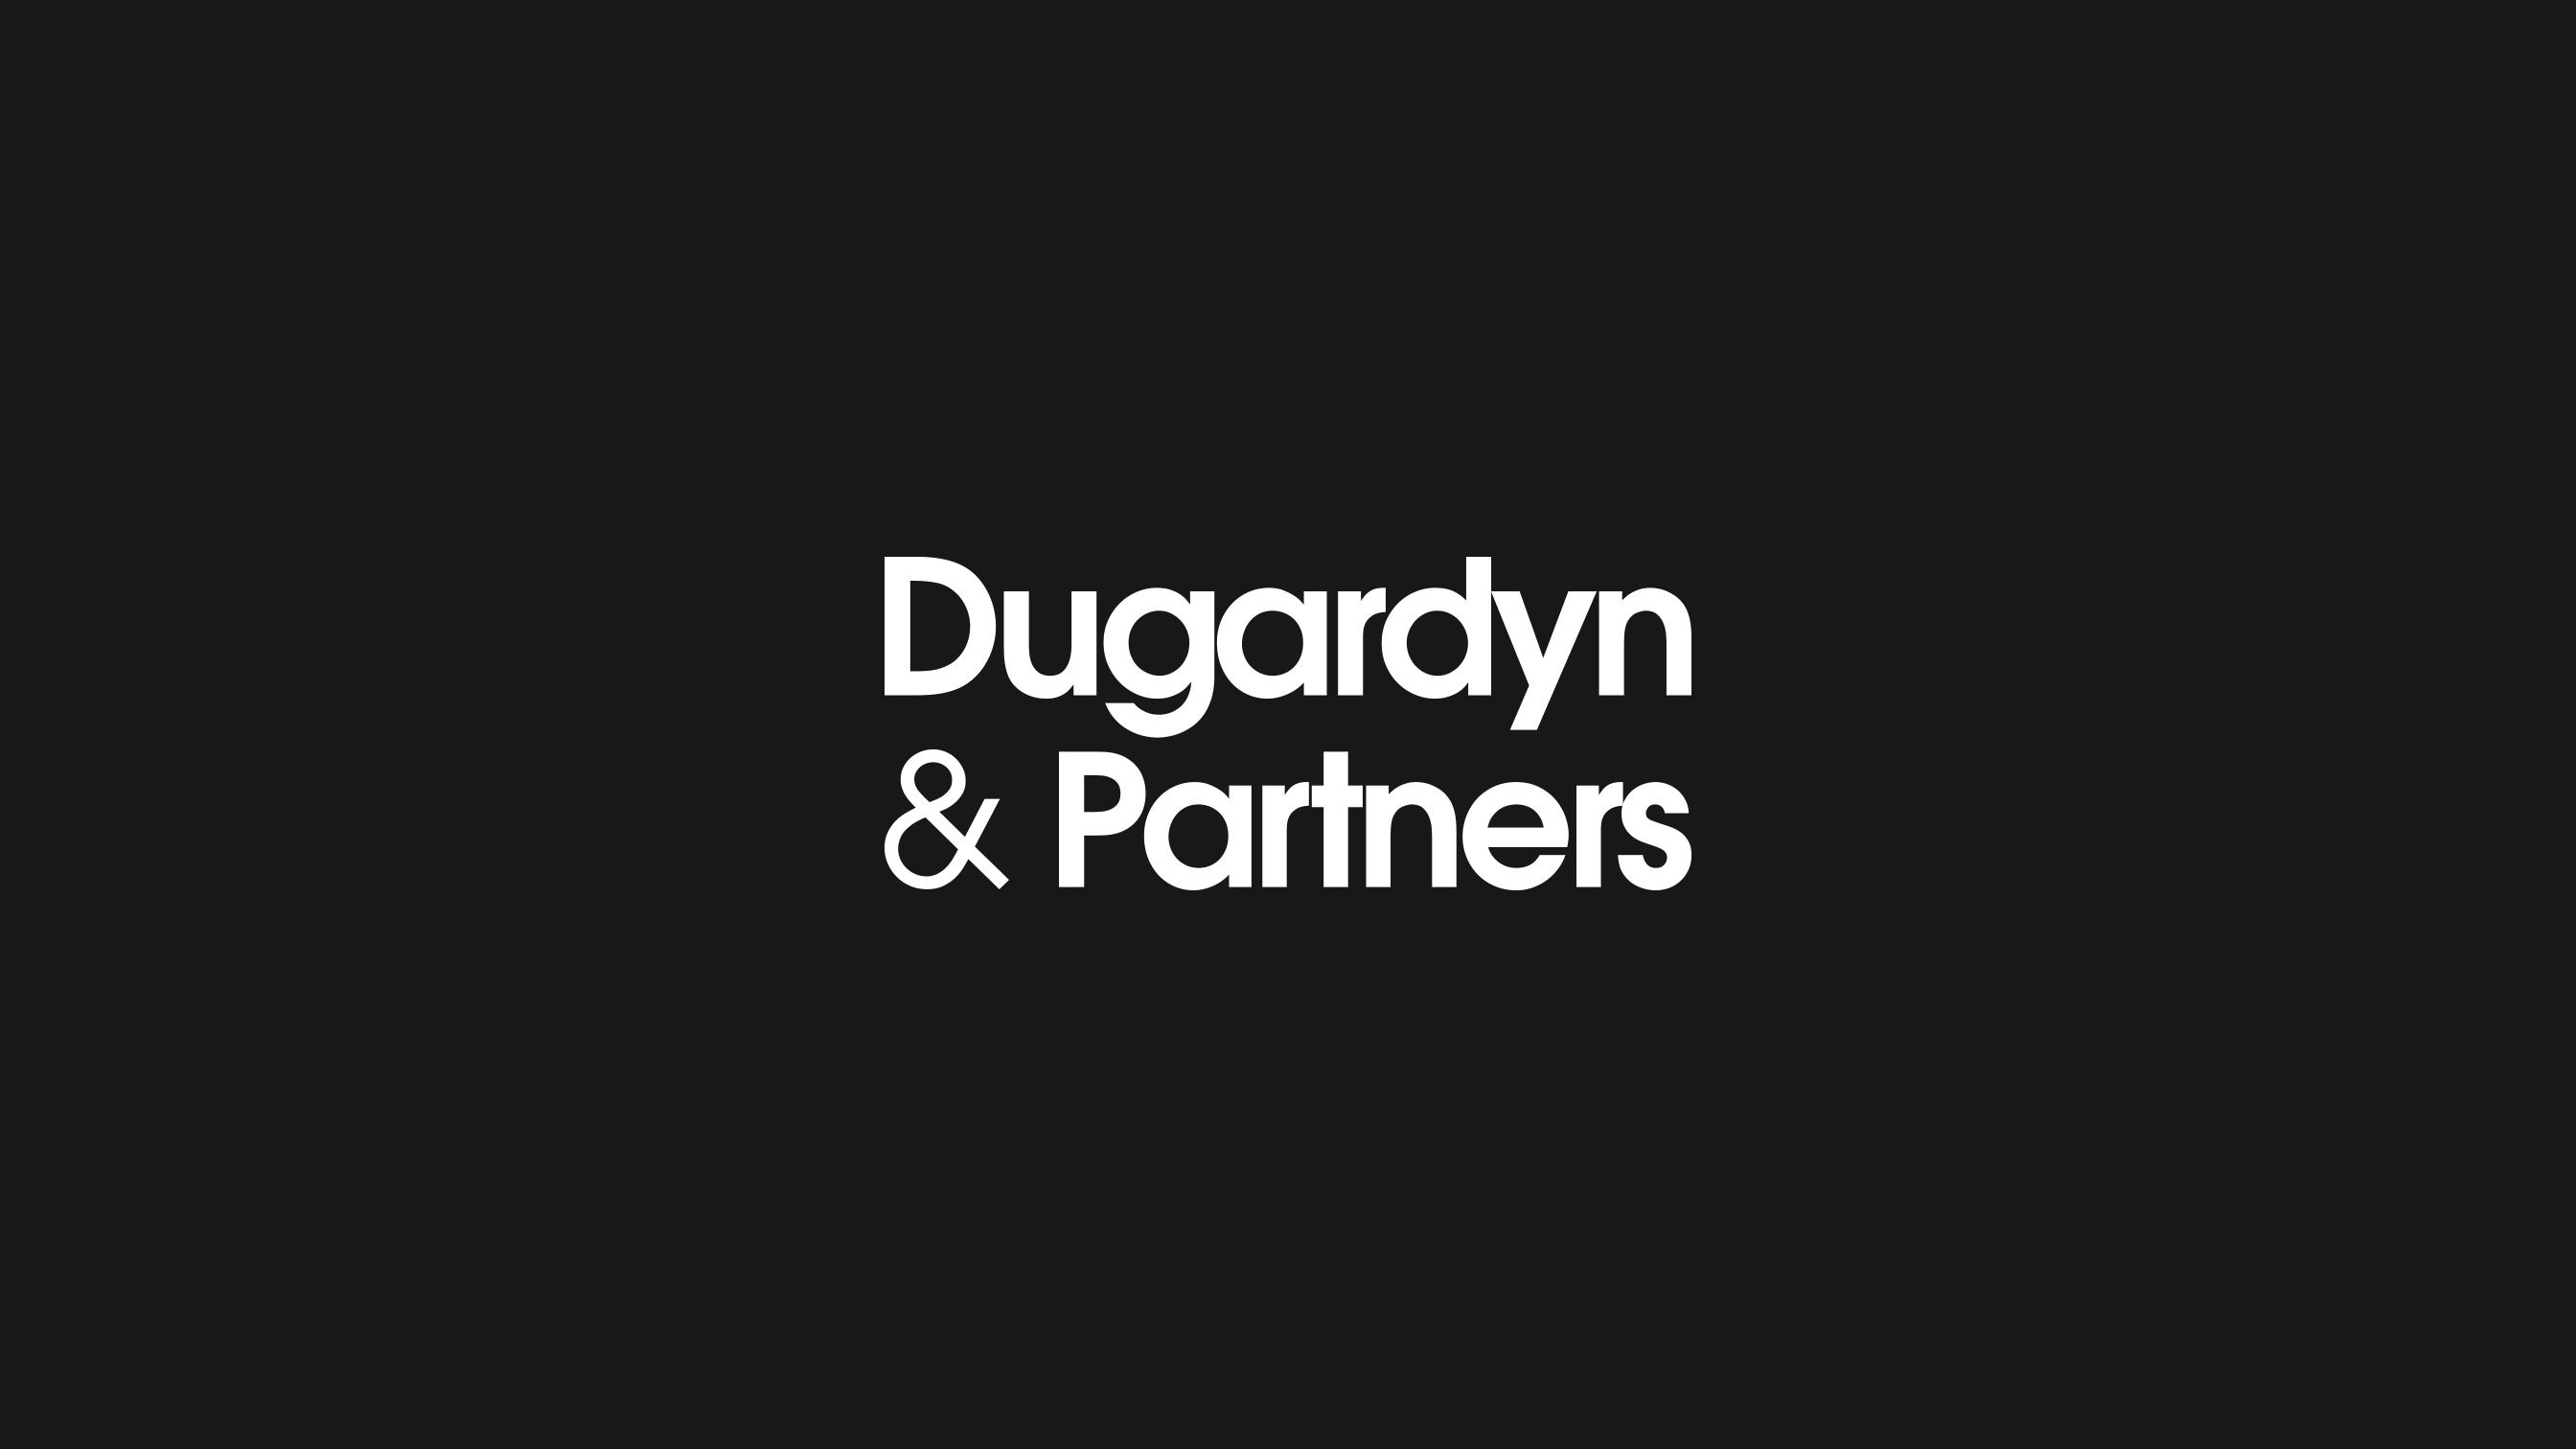 showcase-logotype-dugardyn